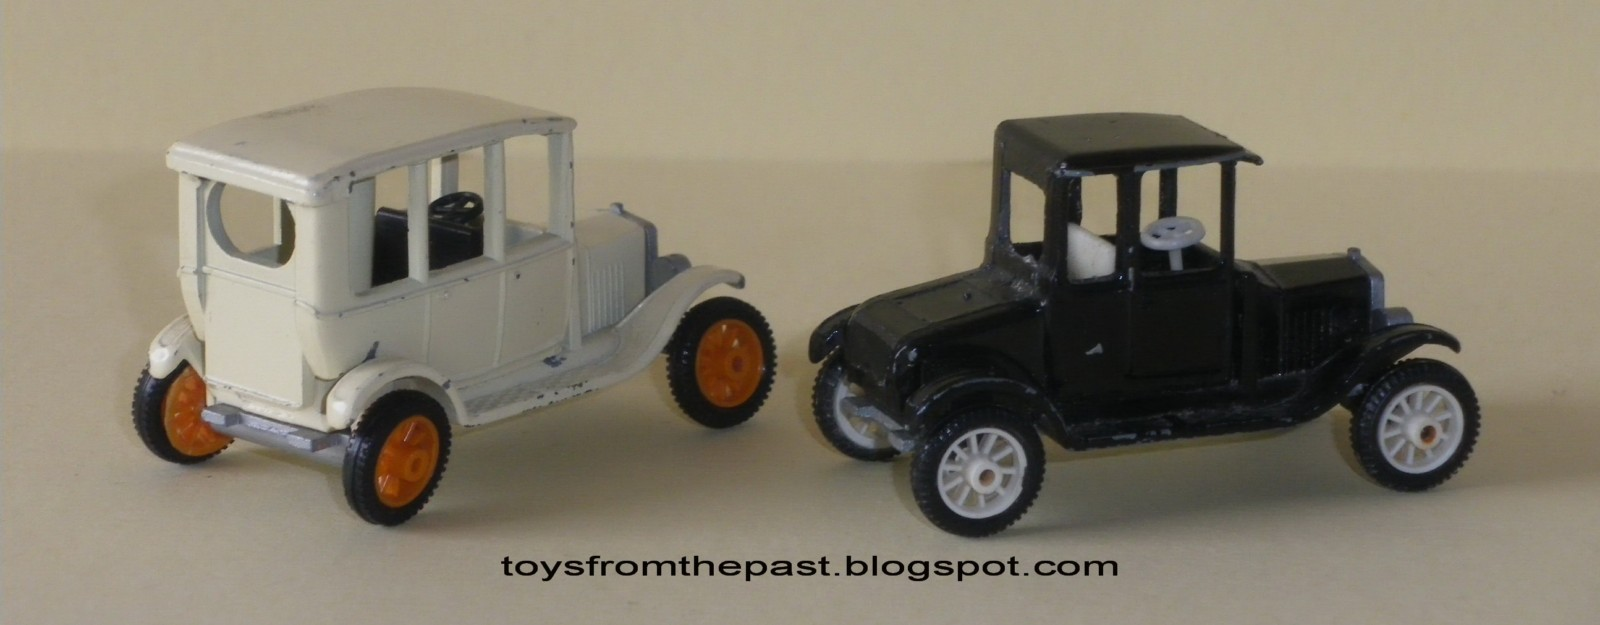 Buying Ebay Car Parts